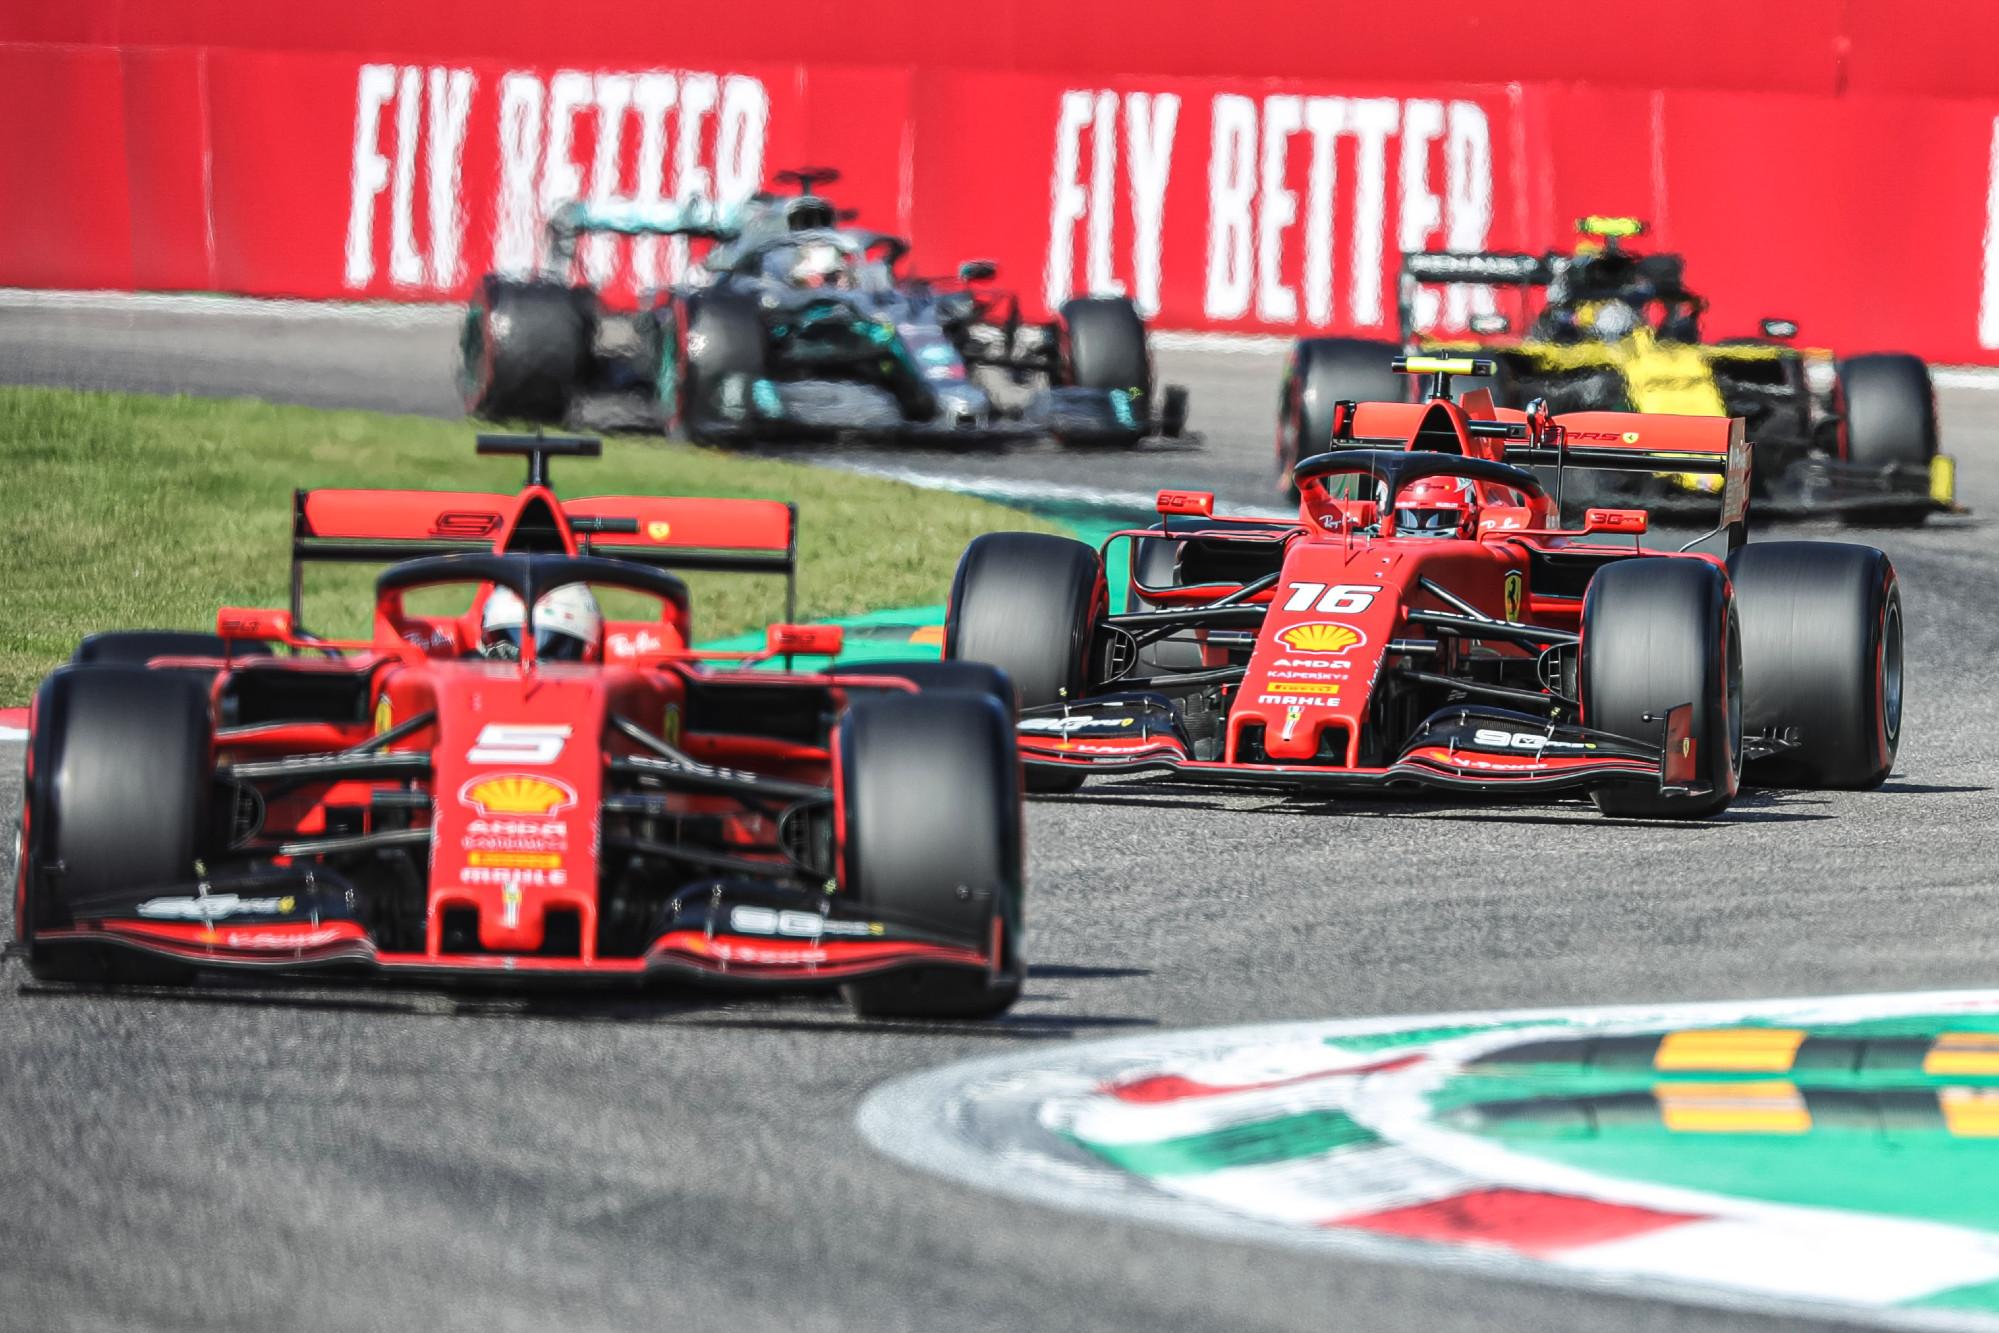 2019 Italian GP qualifying, Charles Lelcerc